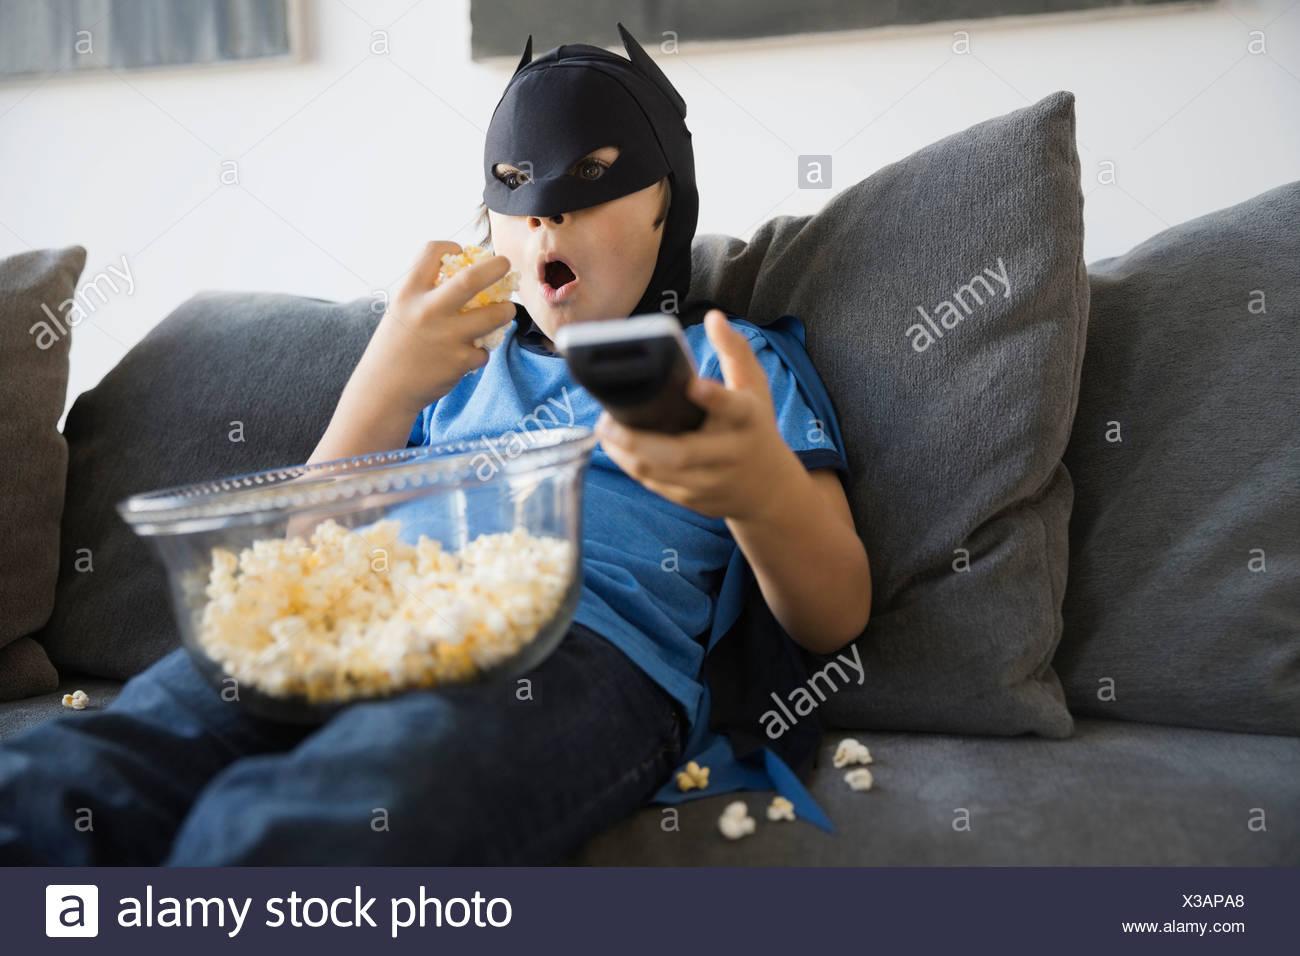 Boy in superhero costume watching TV at home - Stock Image